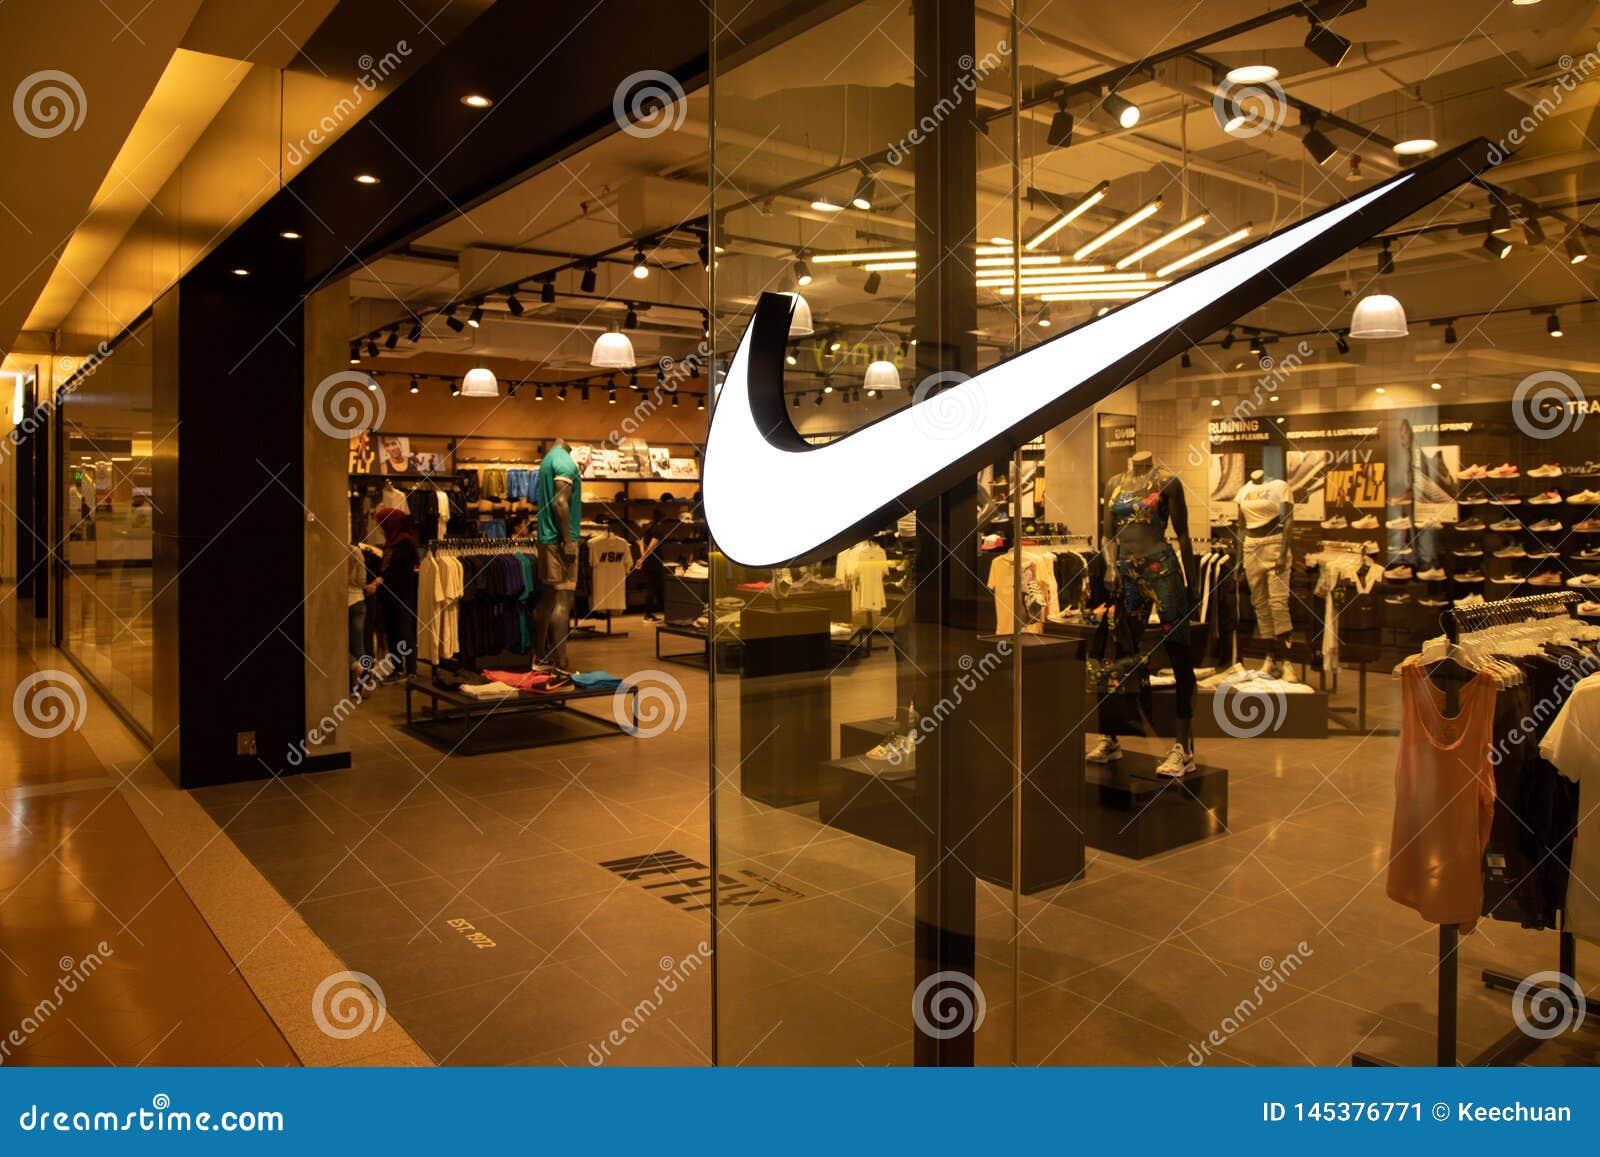 КУАЛА-ЛУМПУР, МАЛАЙЗИЯ, 18-ое апреля 2019: Nike, Inc американская многонациона